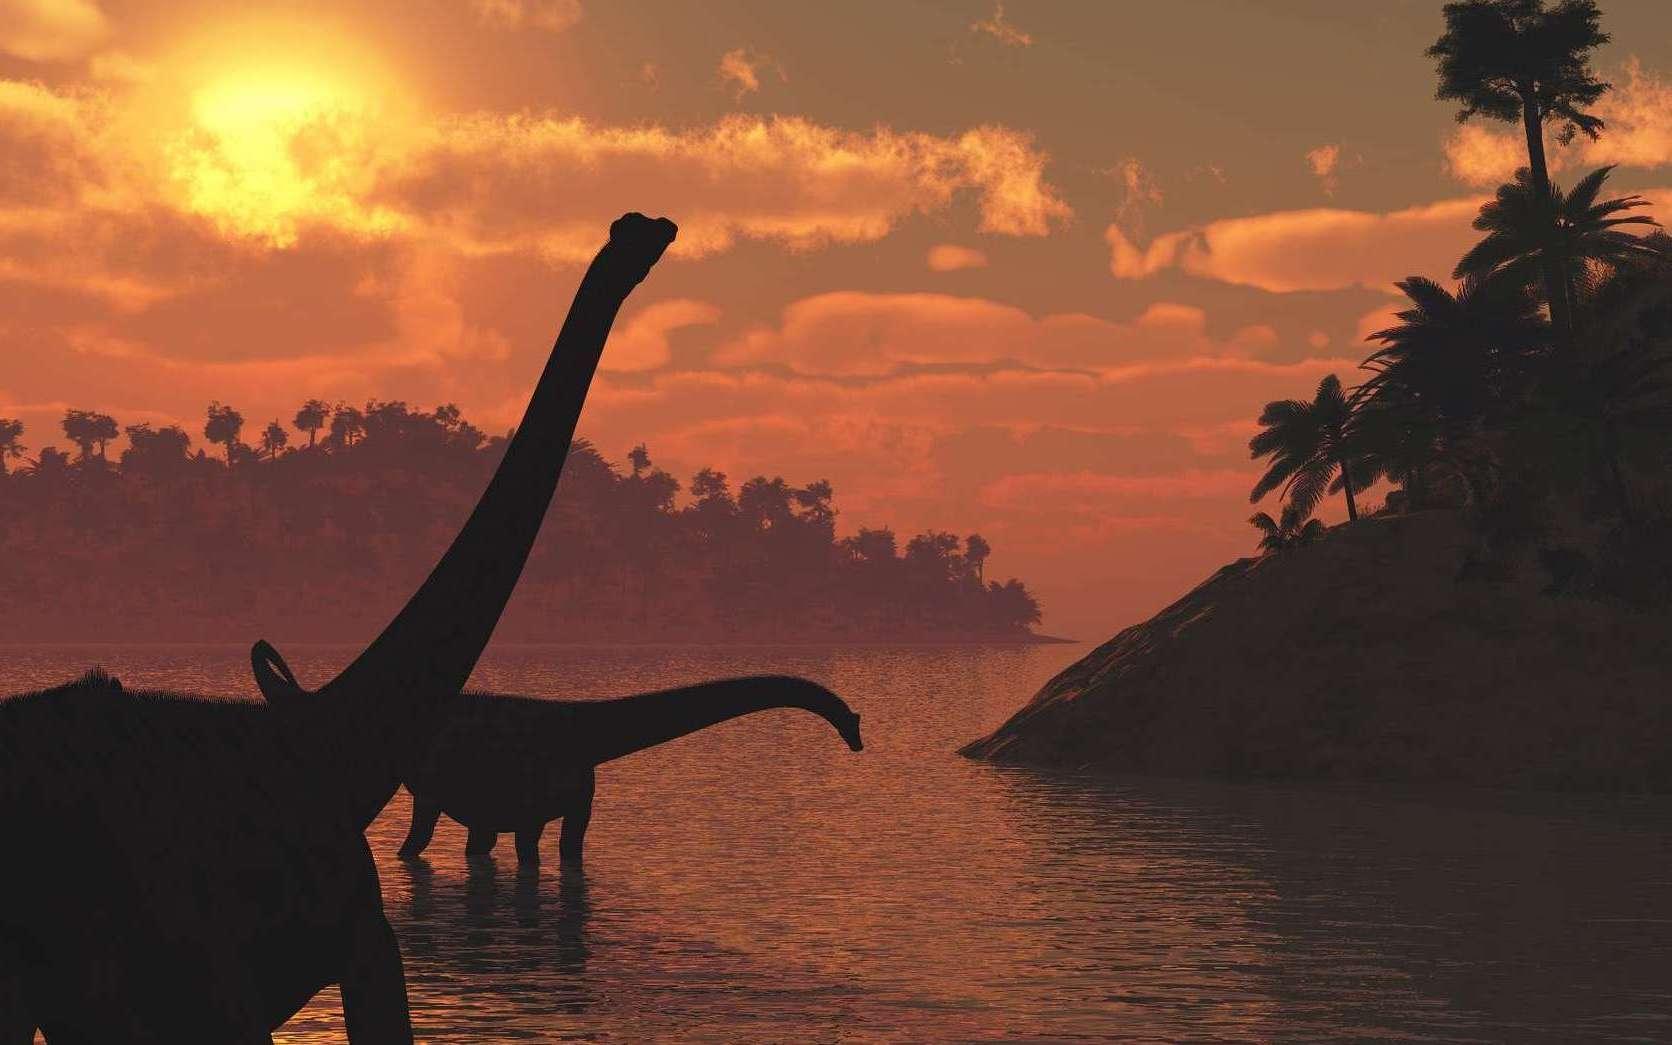 Une vue d'artiste de dinosaures au Jurassique. © Linda Bucklin, Shutterstock